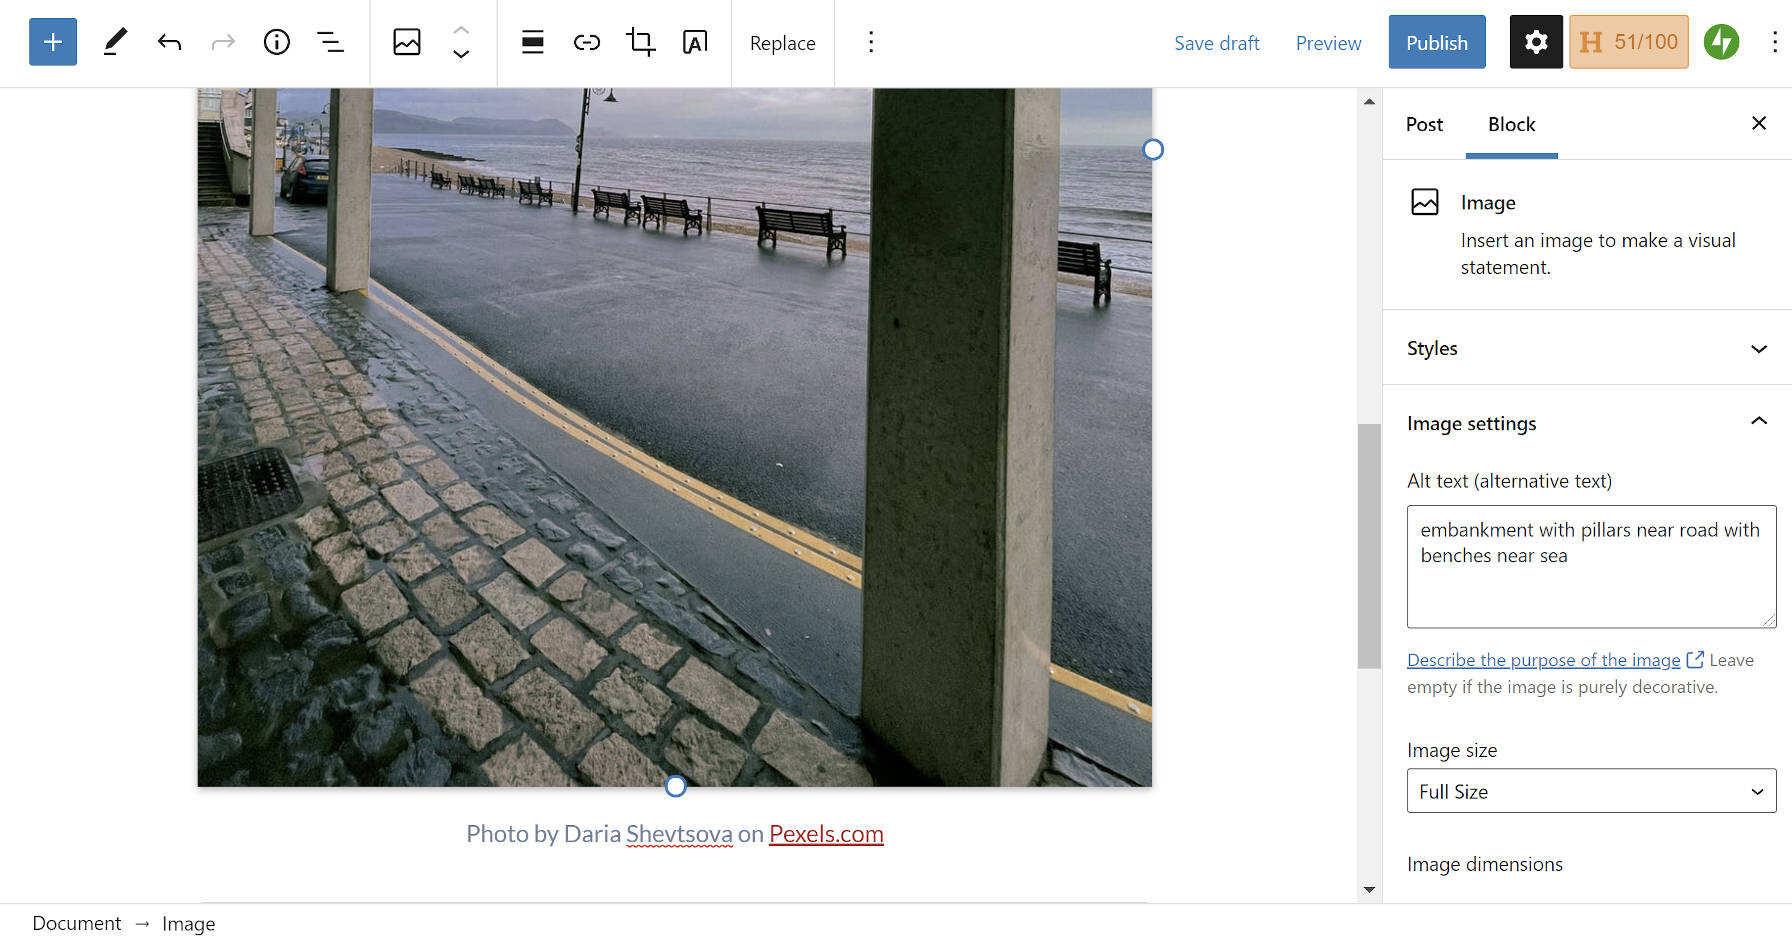 jetpack-pexels-image